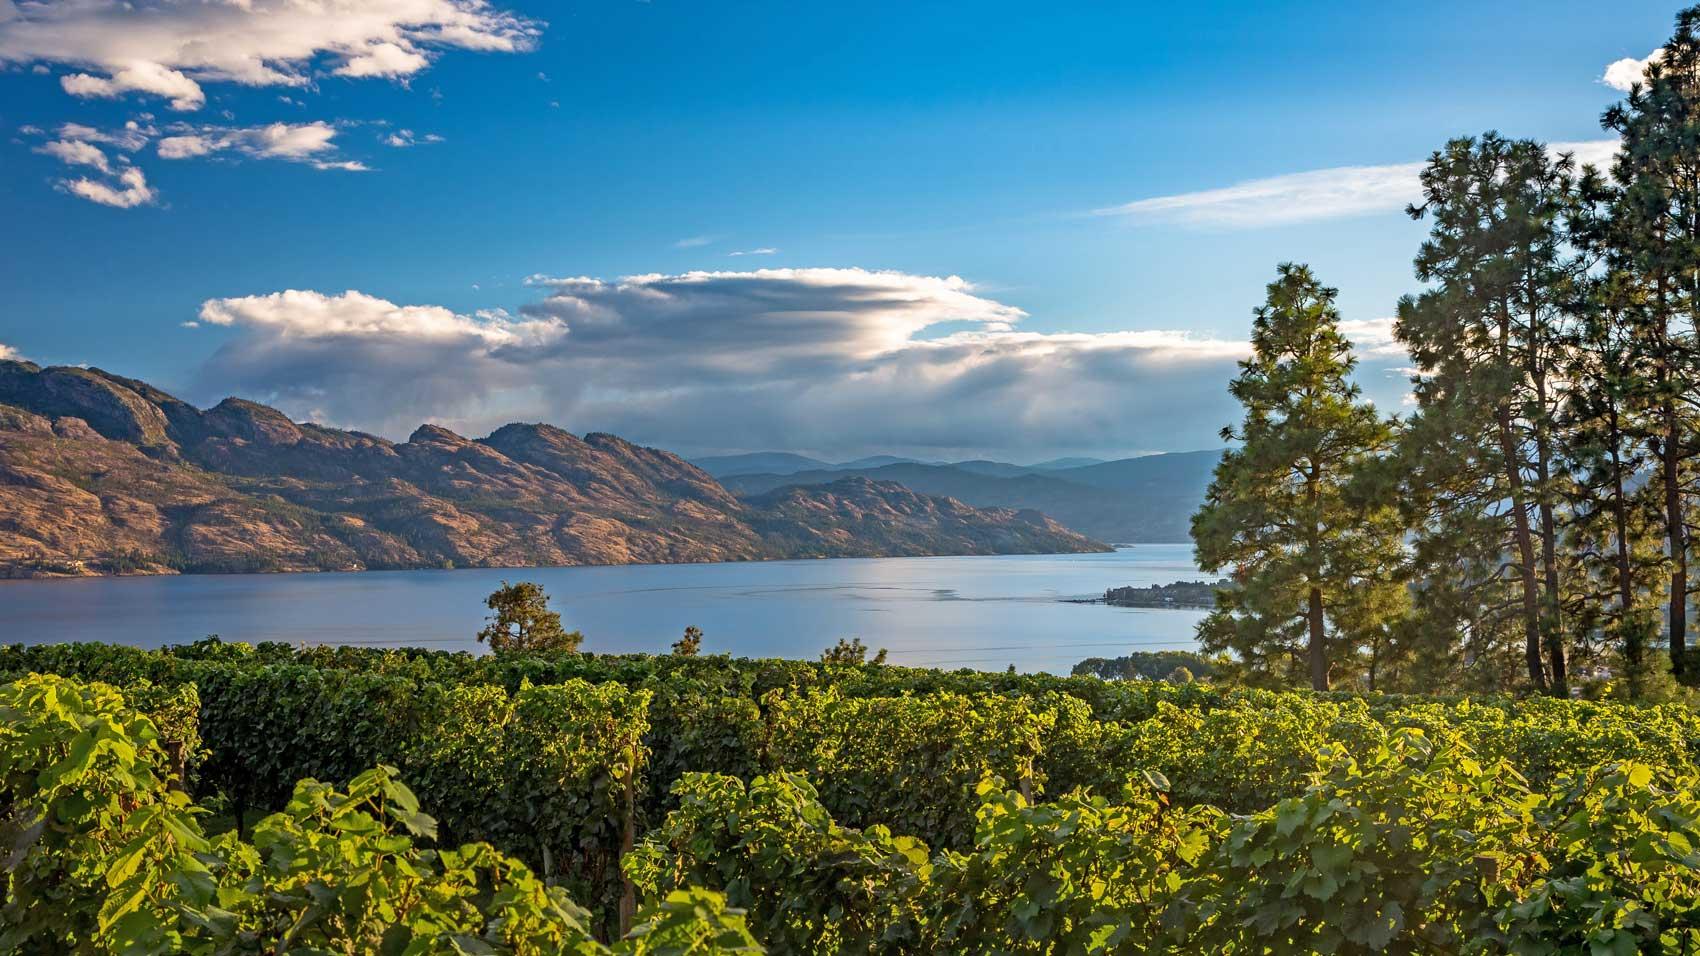 BC romantic getaways, beautiful British Columbia Canada vineyard and Okanagan Lake